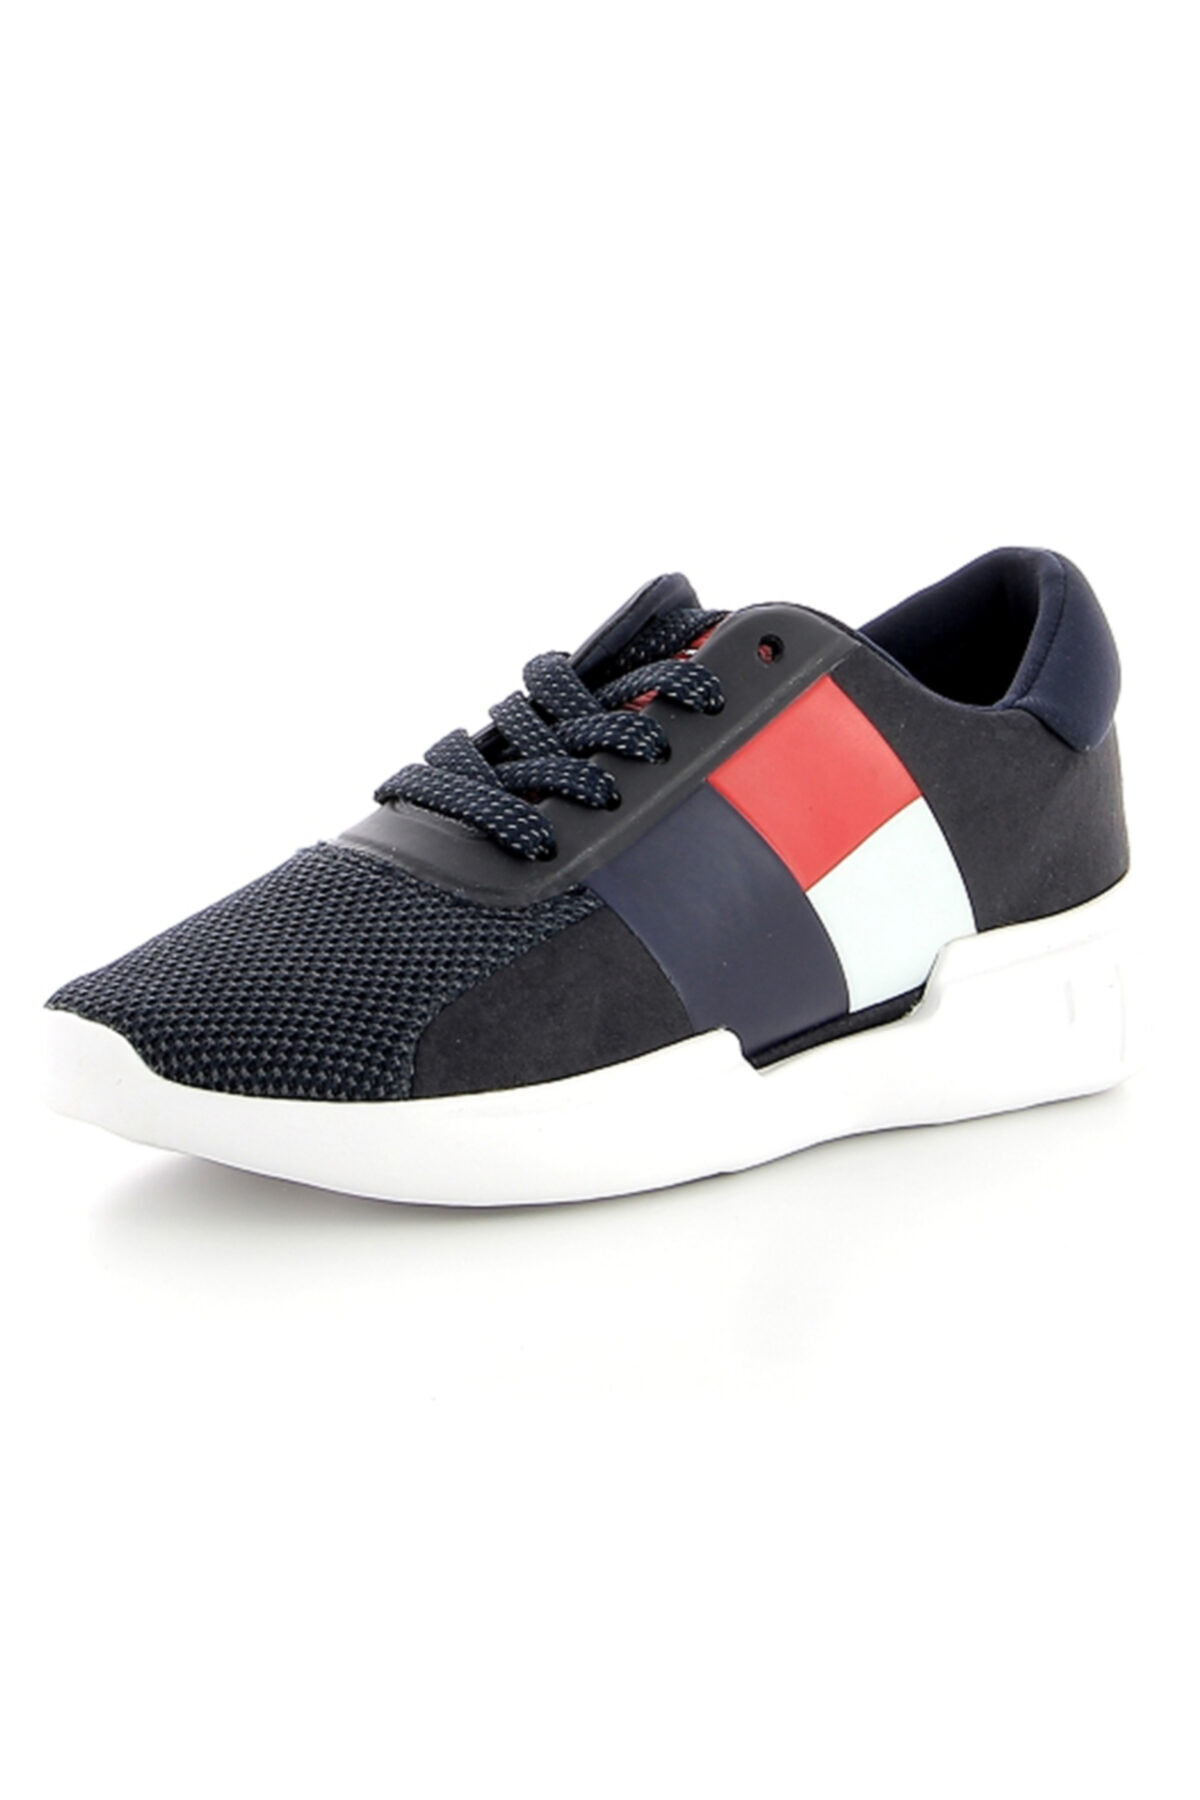 Tommy Hilfiger Kadın Ayakkabı Tom000345b10567 D002862 2